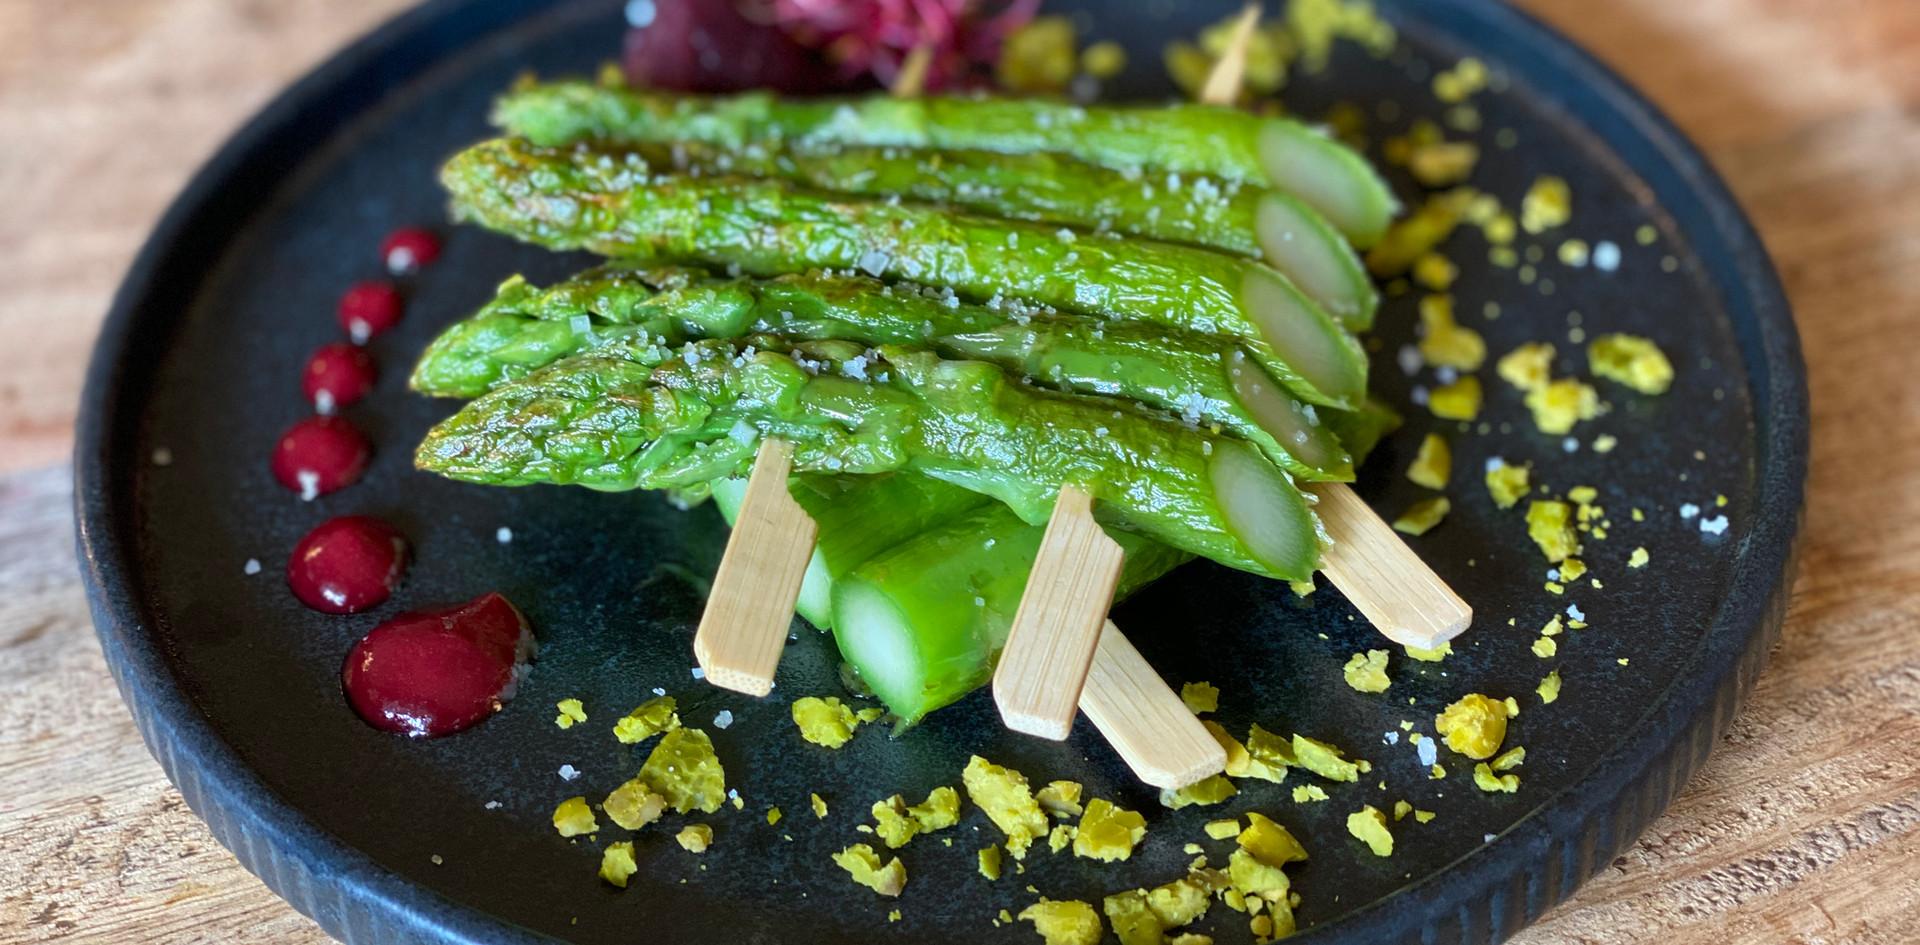 grüner Spargel Restaurant Dinner - Hotel Wegner - The culinary Art Hotel